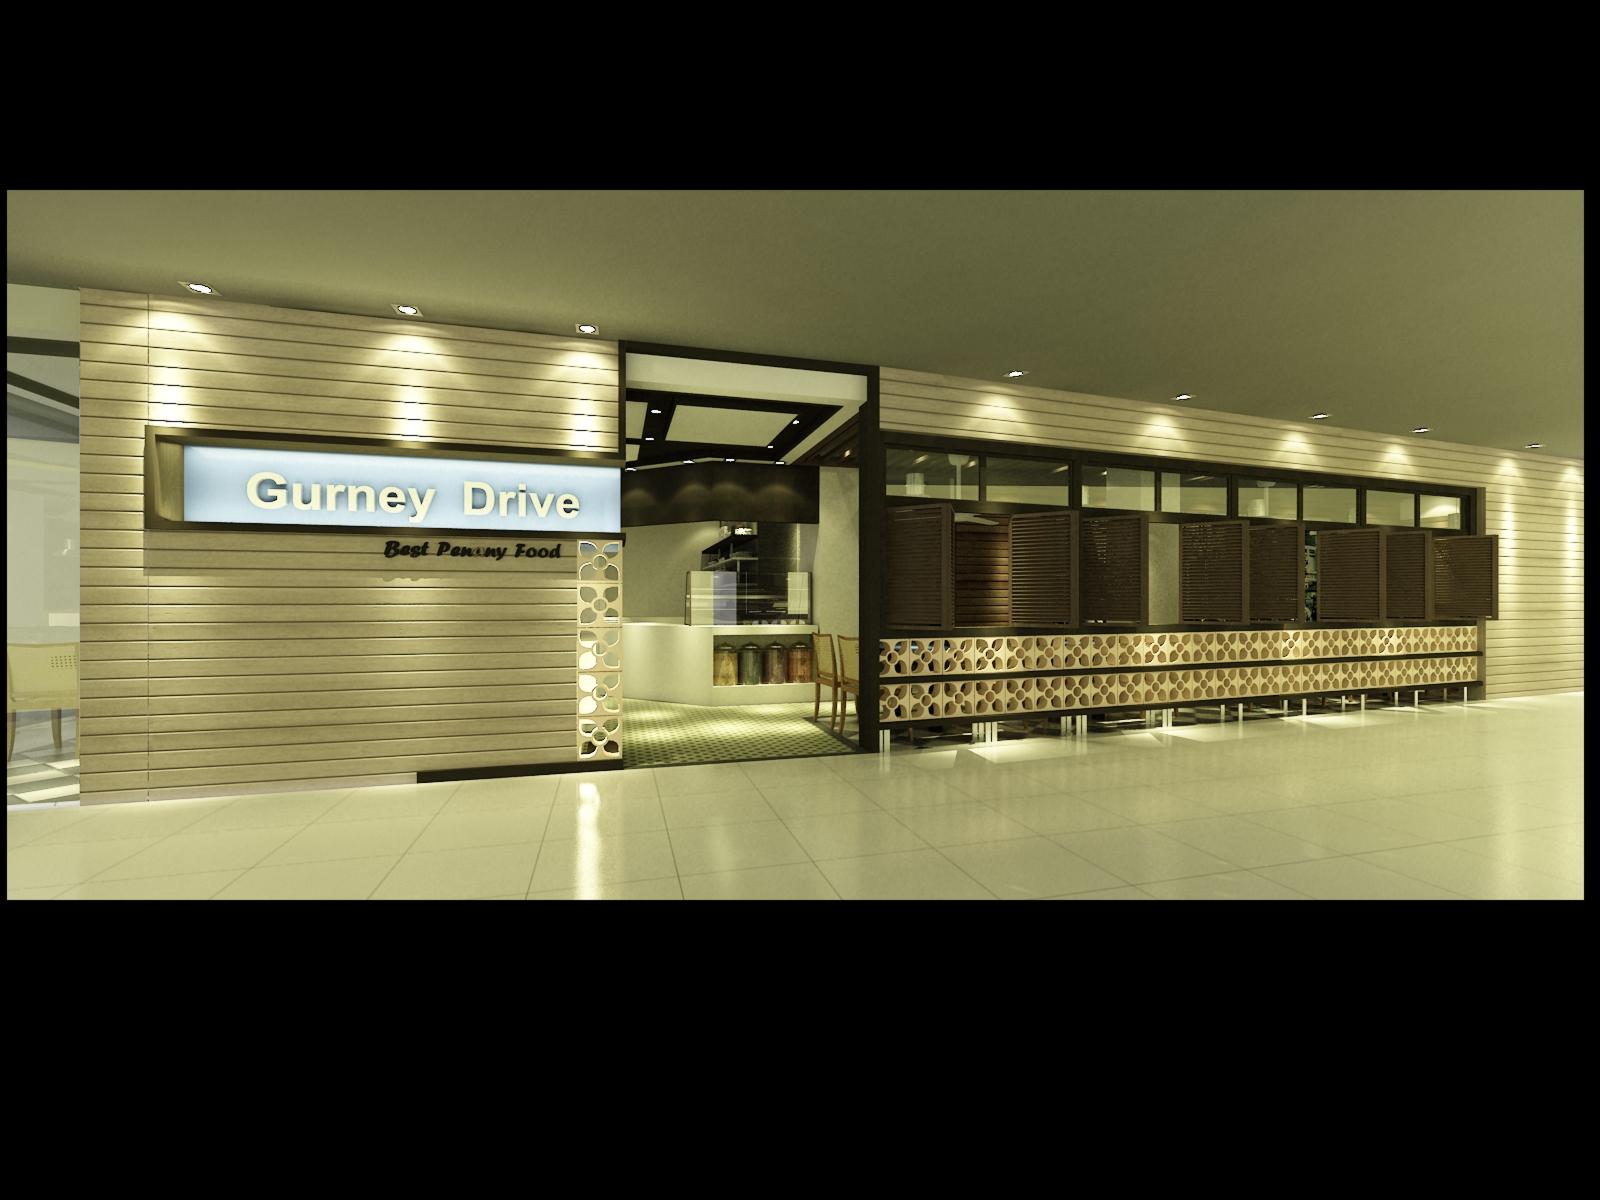 Gurney Drive penang restaurant